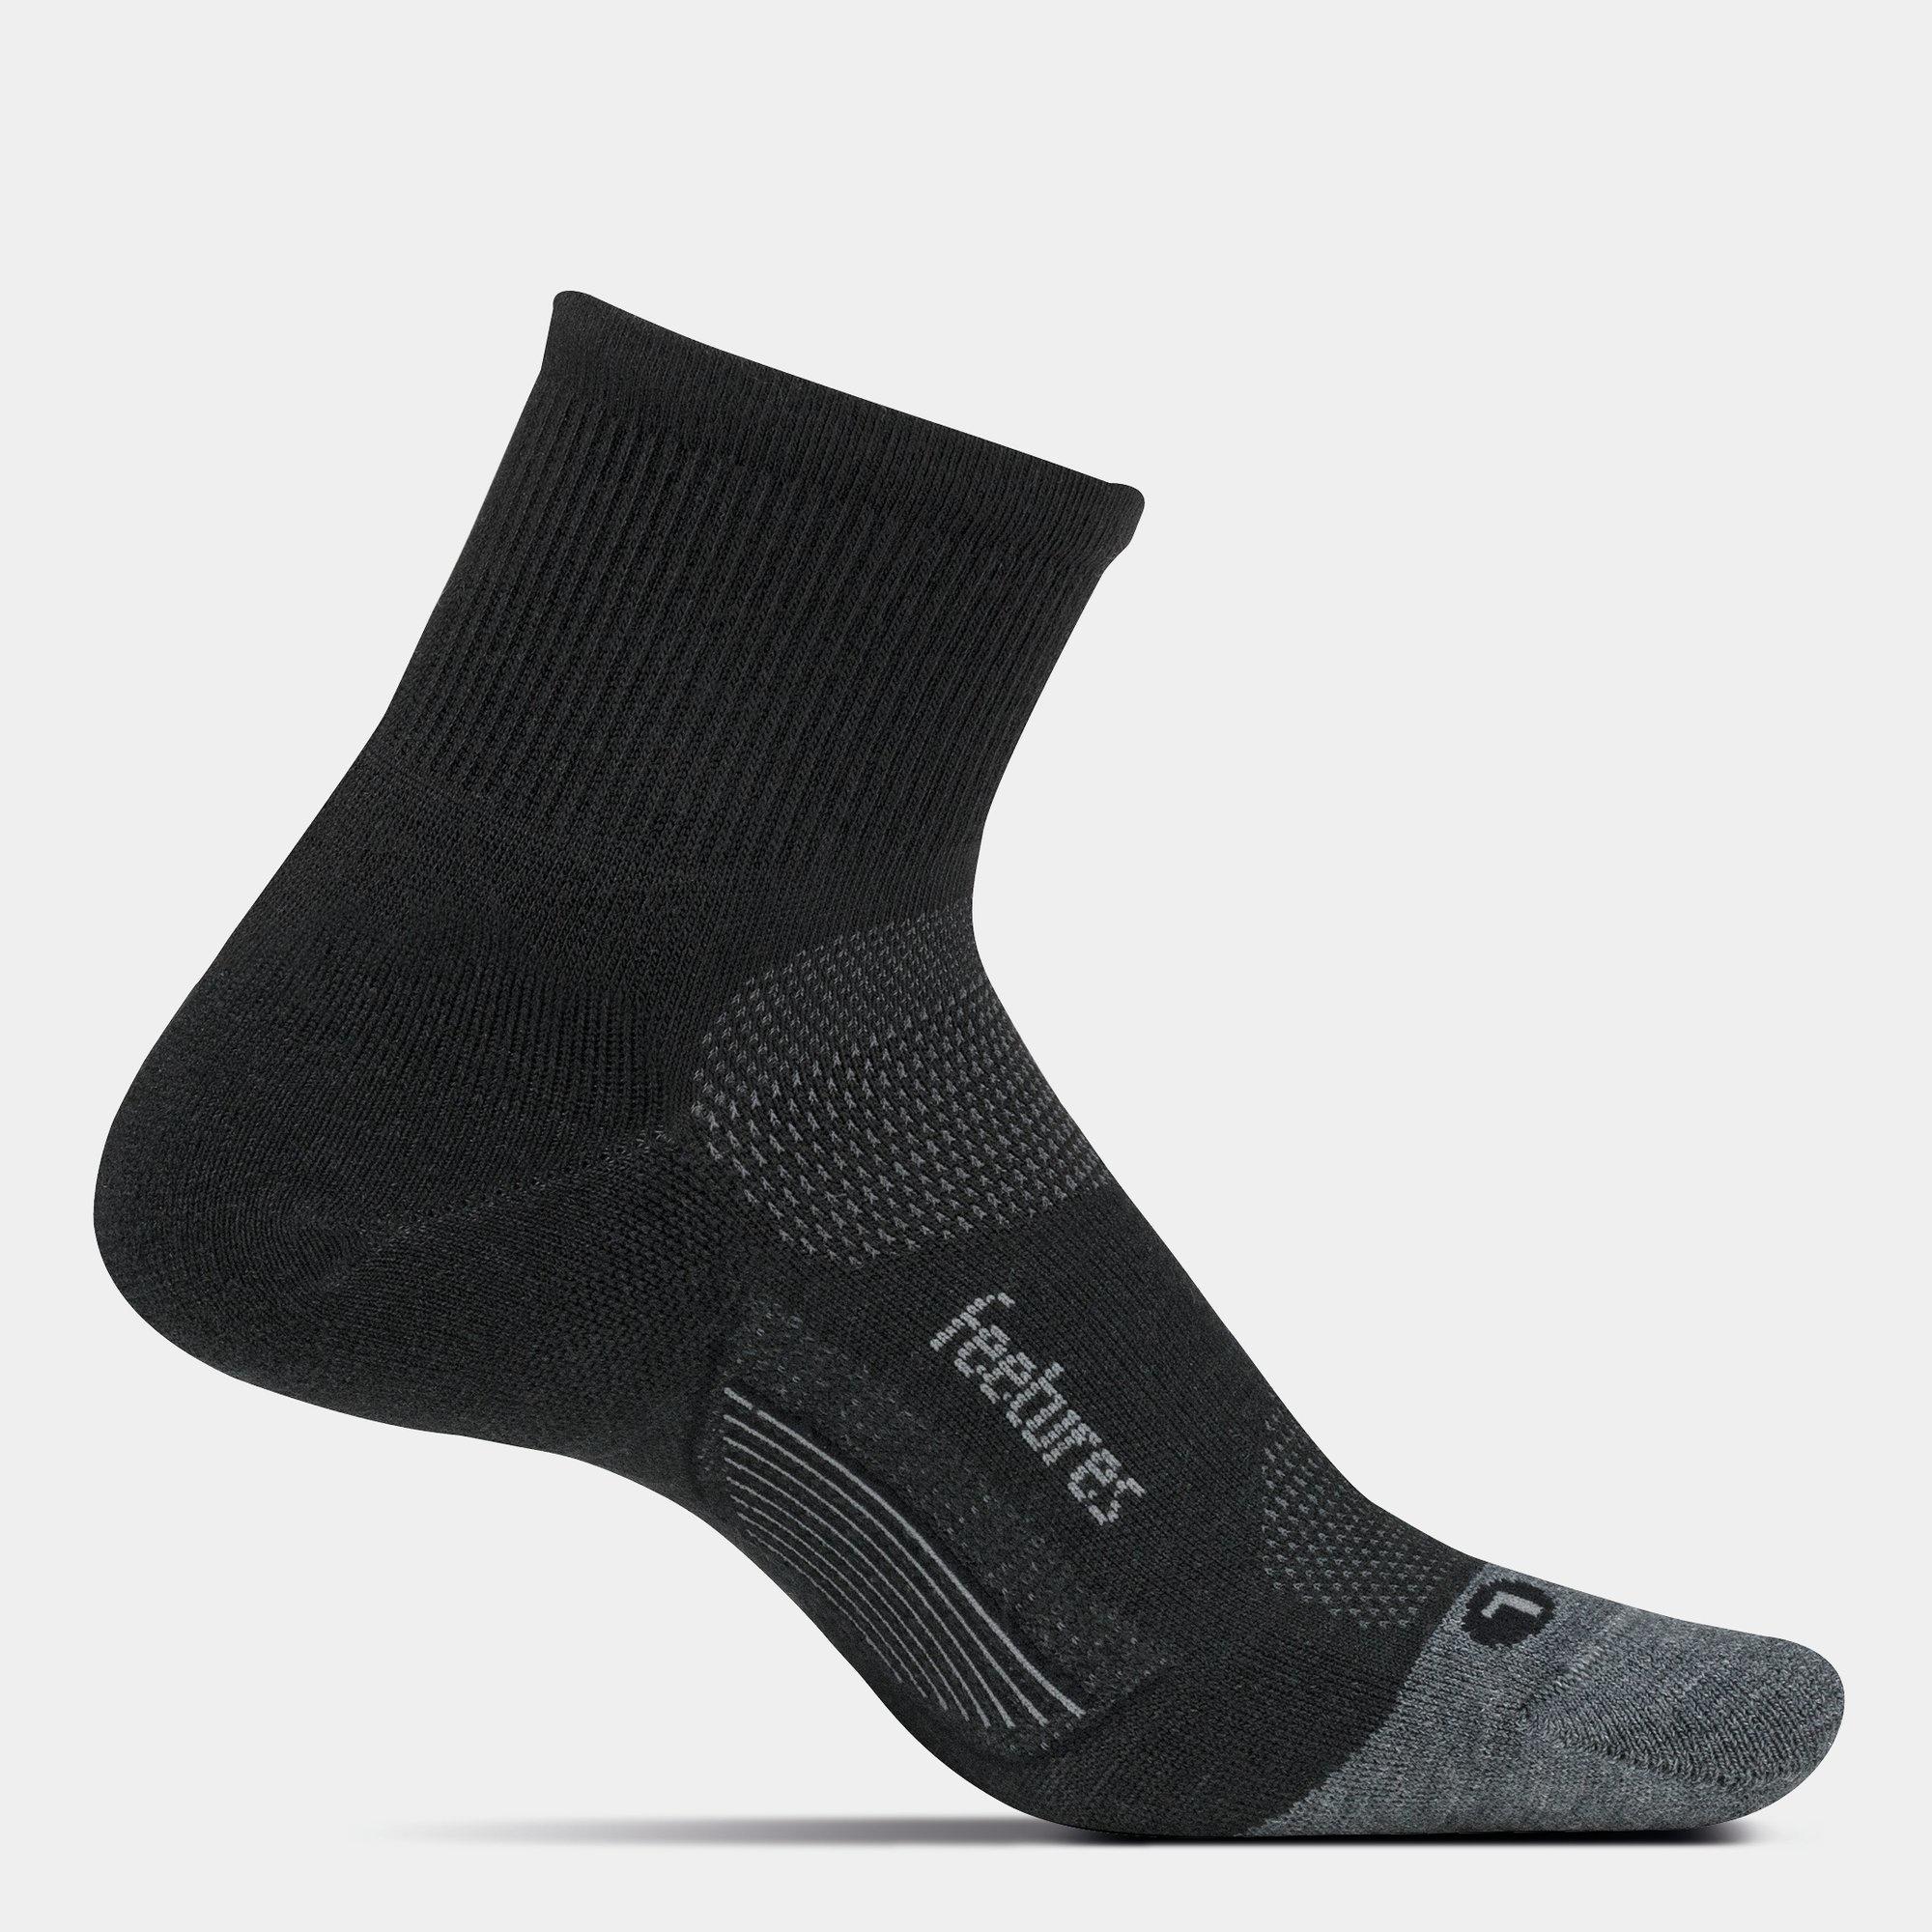 Feetures Merino10 Cushion - Quarter